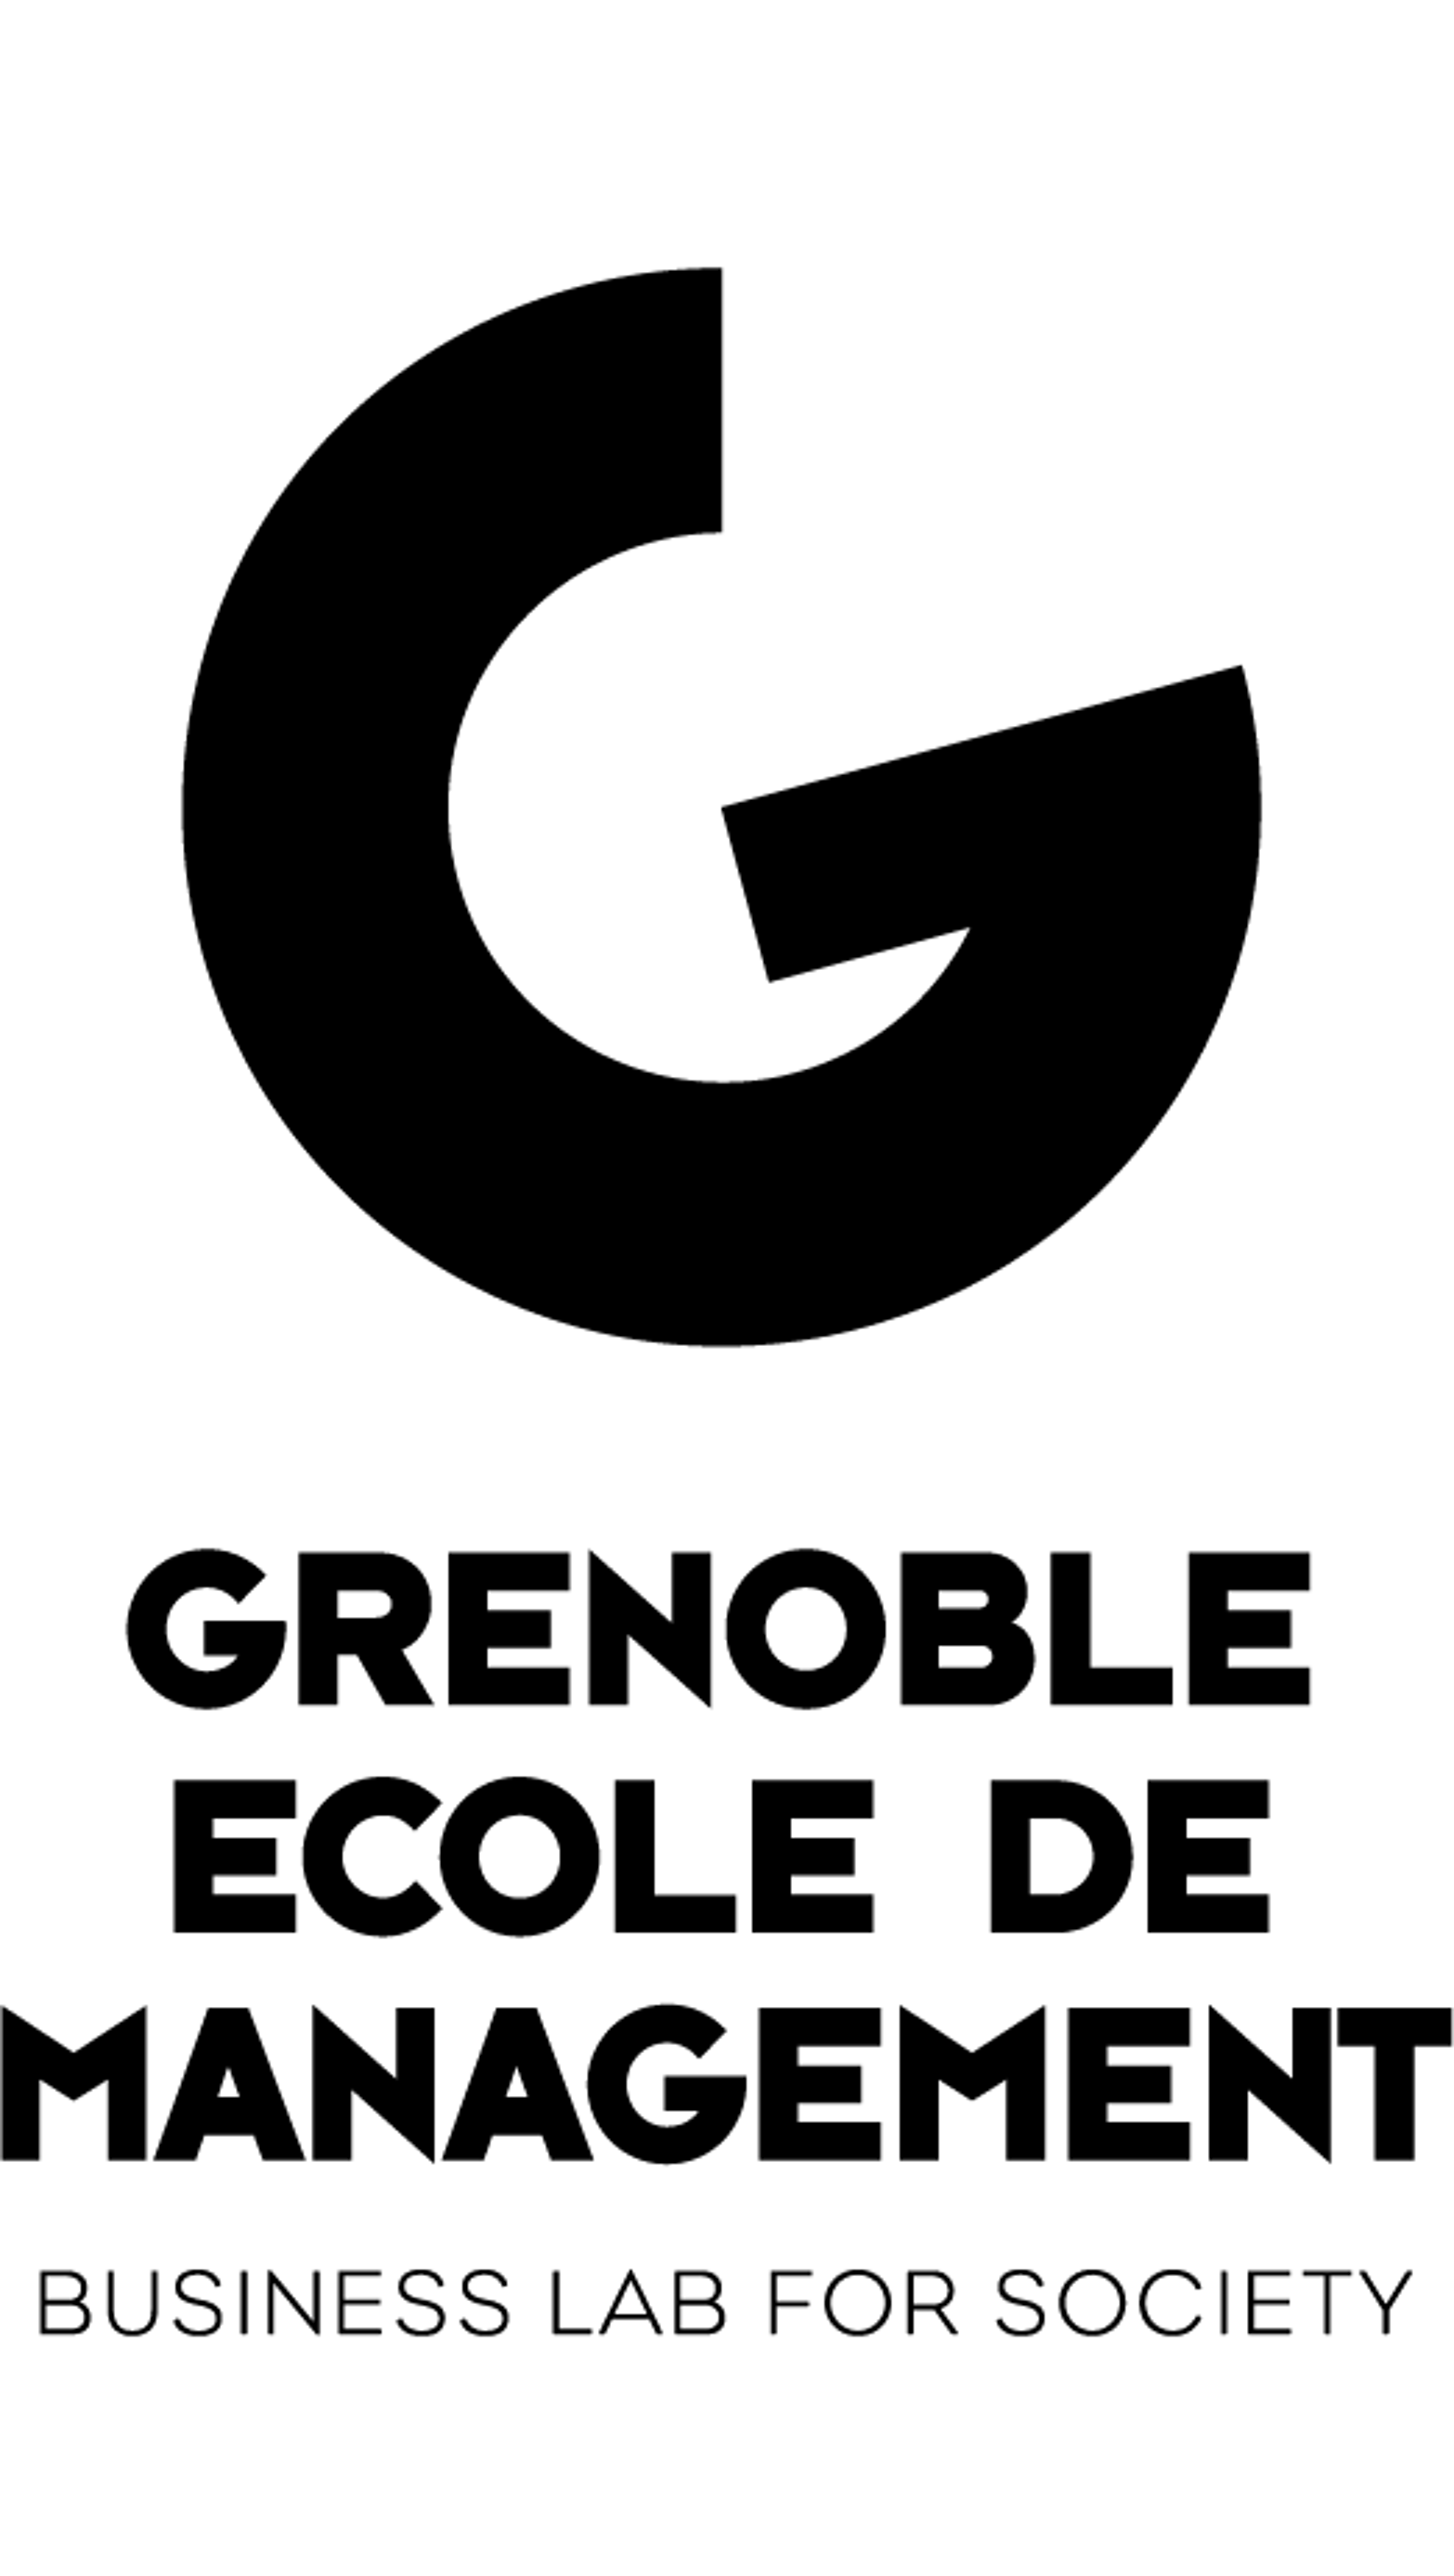 Logo 1525693379.png?ixlib=rb 1.1